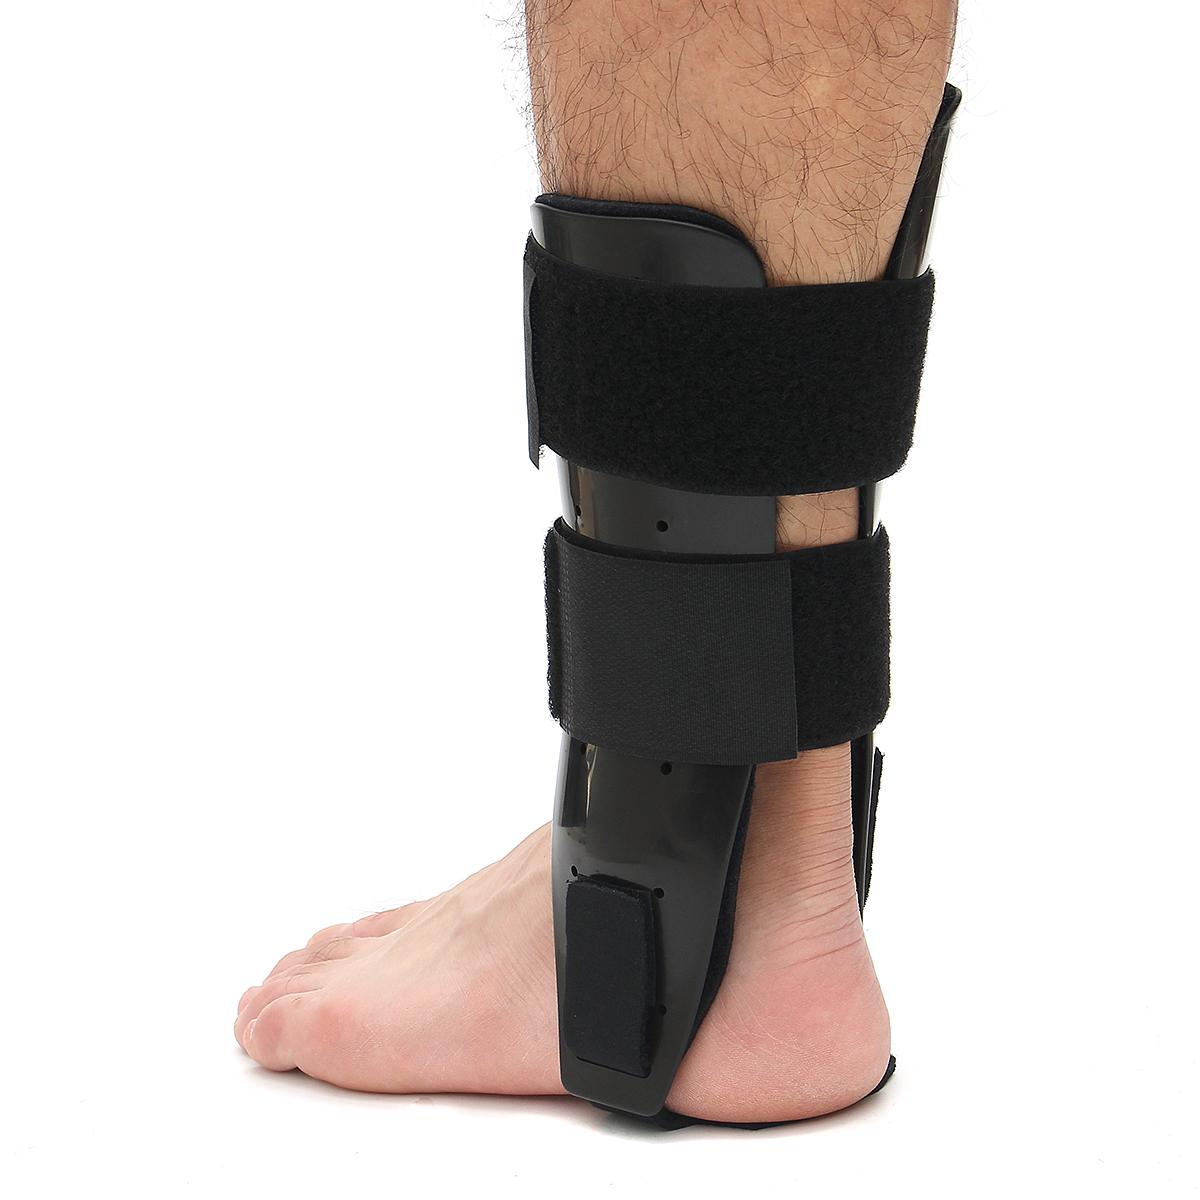 Adjustable Ankle Support Brace Foot Sprain Injury Wrap Splint Sports Gym Strap